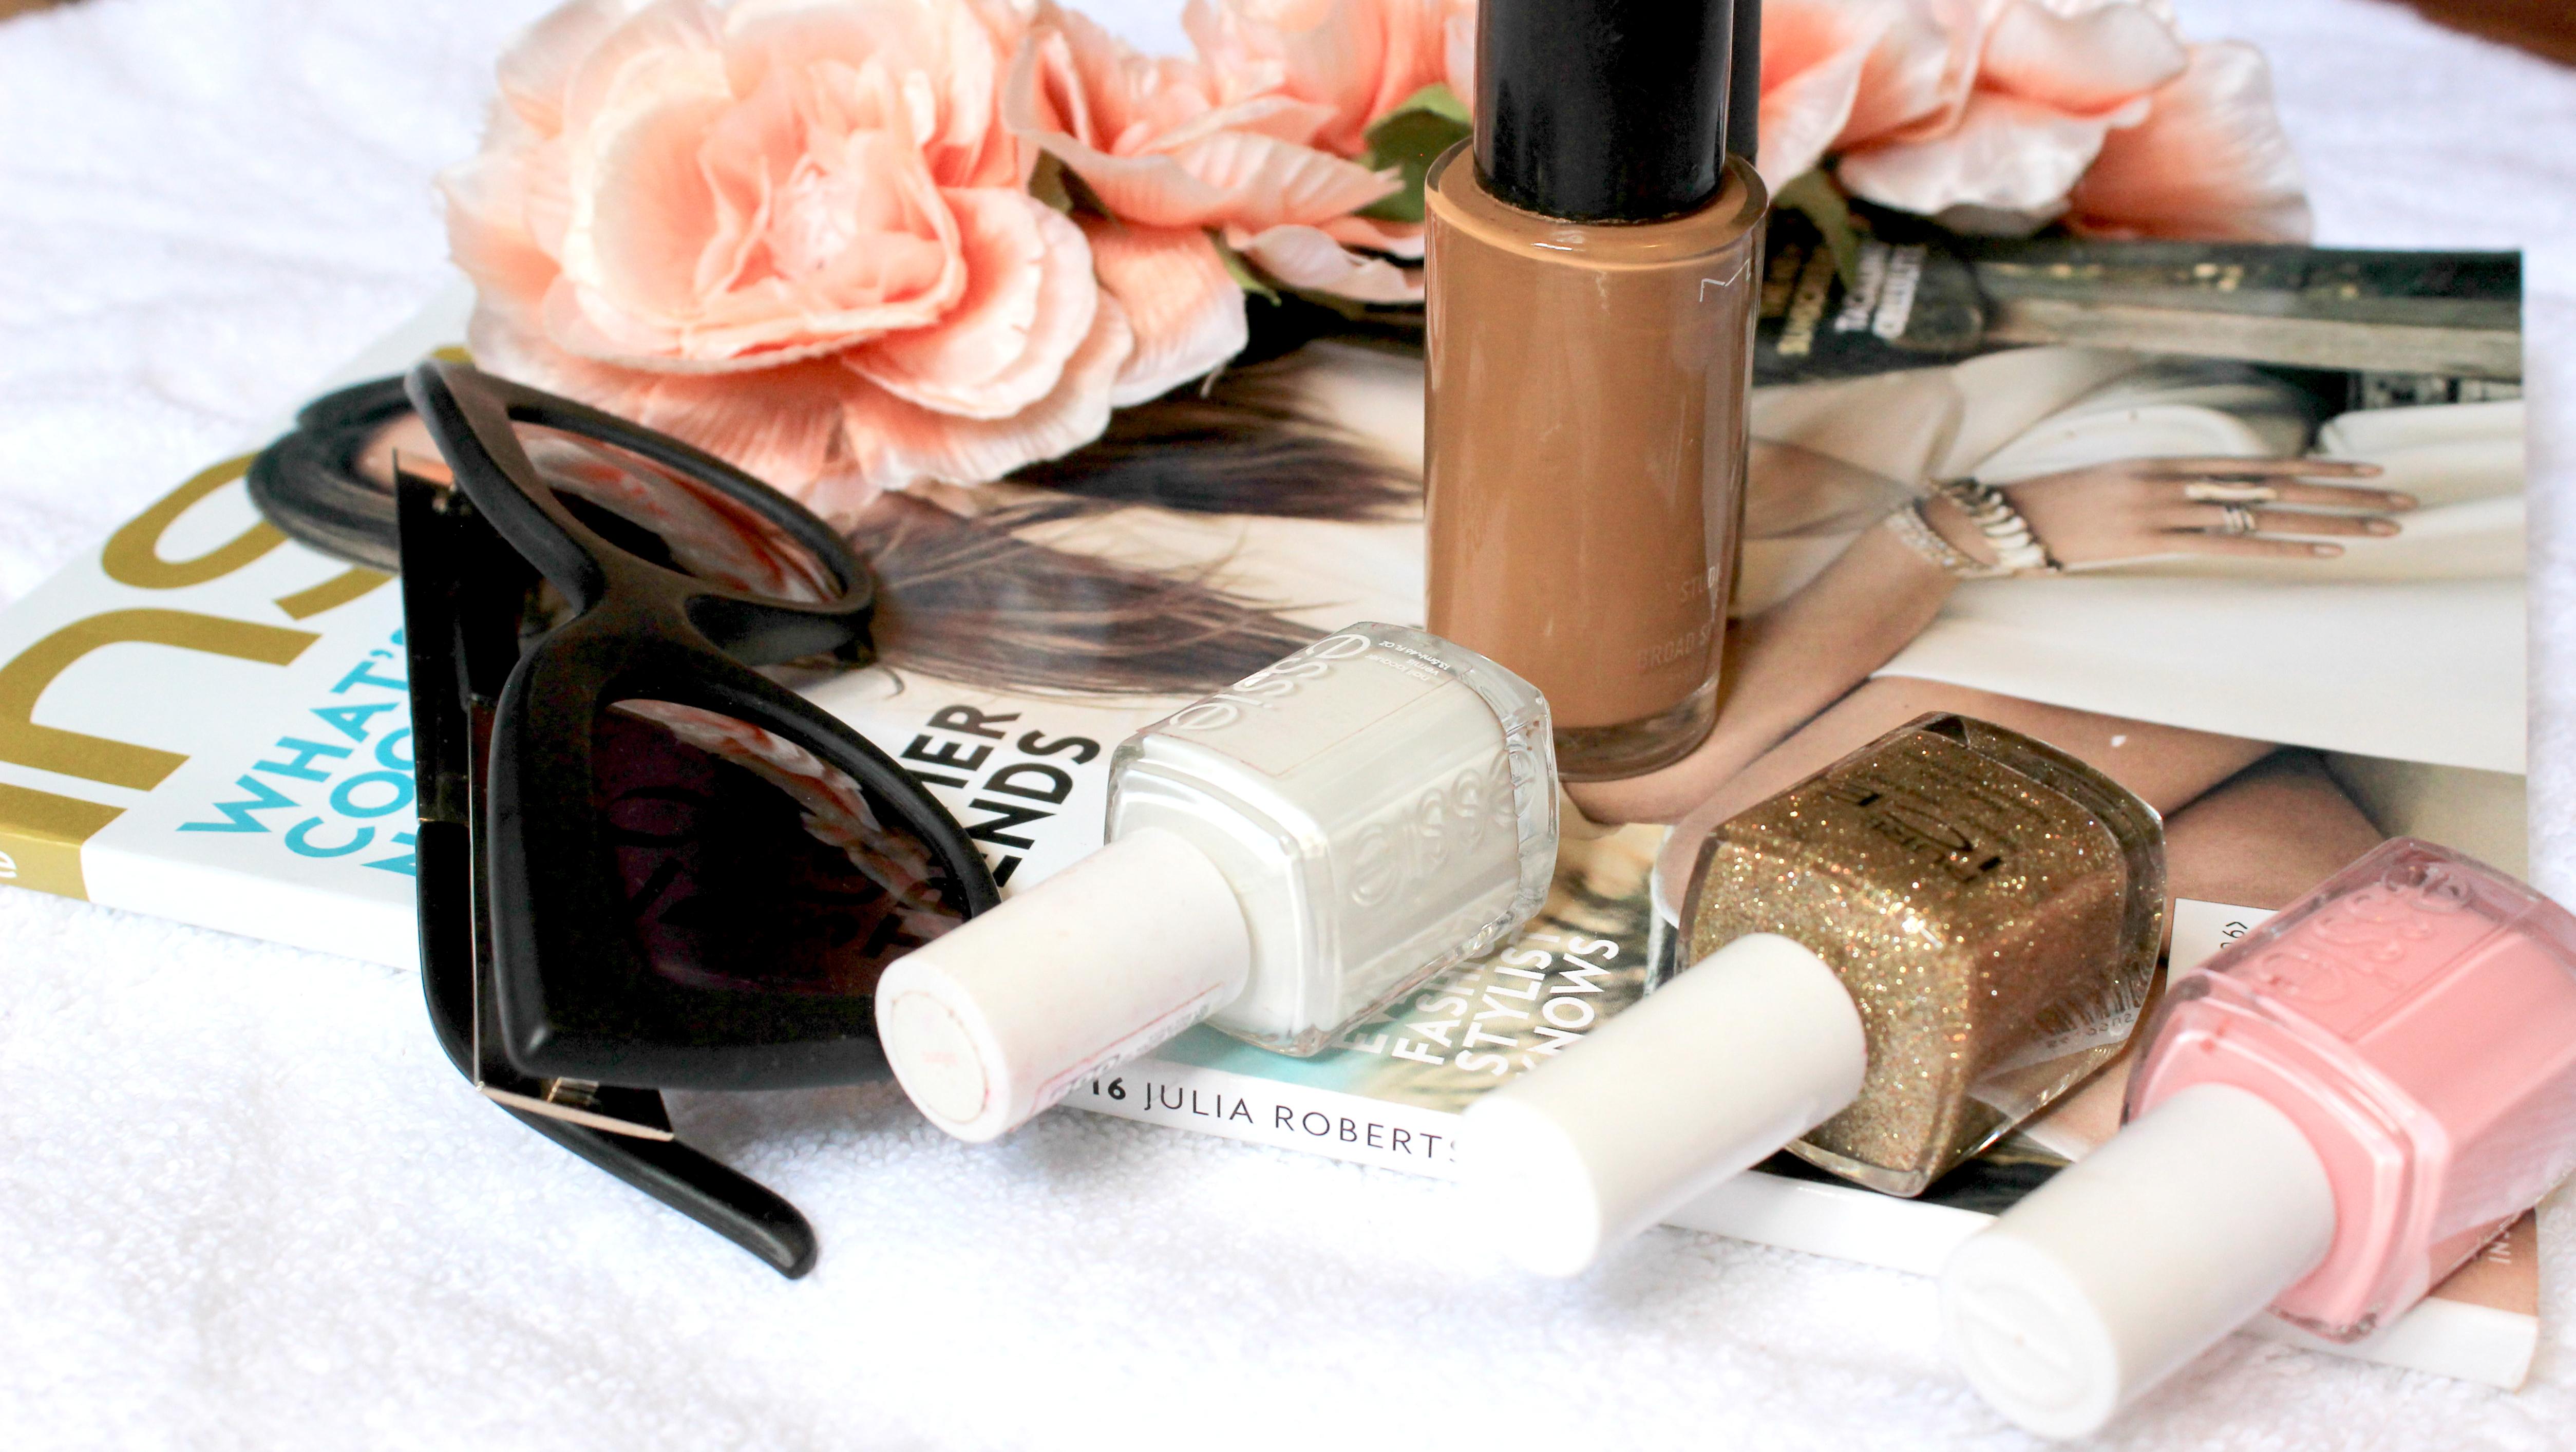 MAC-Cosmetics-Prolong-wear-concealer-Studio-fix-fluid-MAC-Amber-Lights-MAC-Brown-Script-Eye-Shadow-MAC-Pigment-Tan-MAC-Faux-lipstick-Makeup-Mondays-Oohlalablog-18